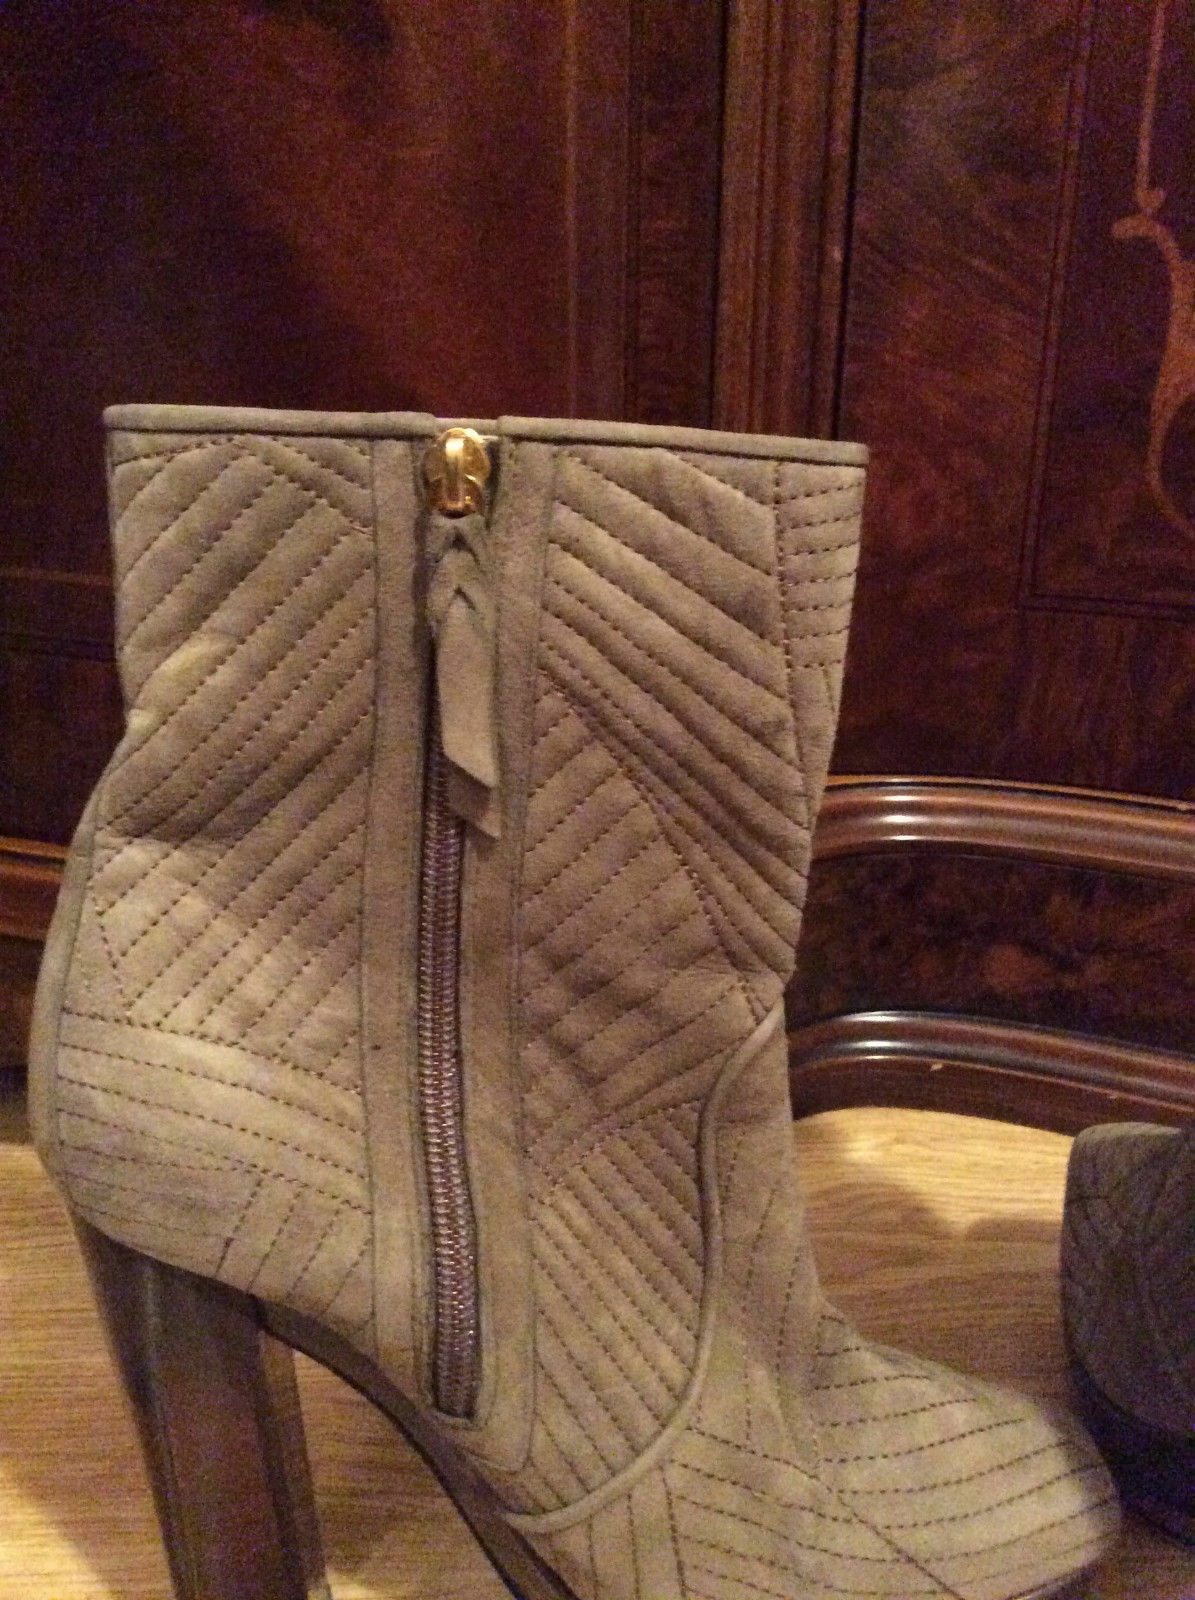 POLLINI 1290    grau suede isabel marant dustbag block heel ankle Stiefel 38 5 efbdfb